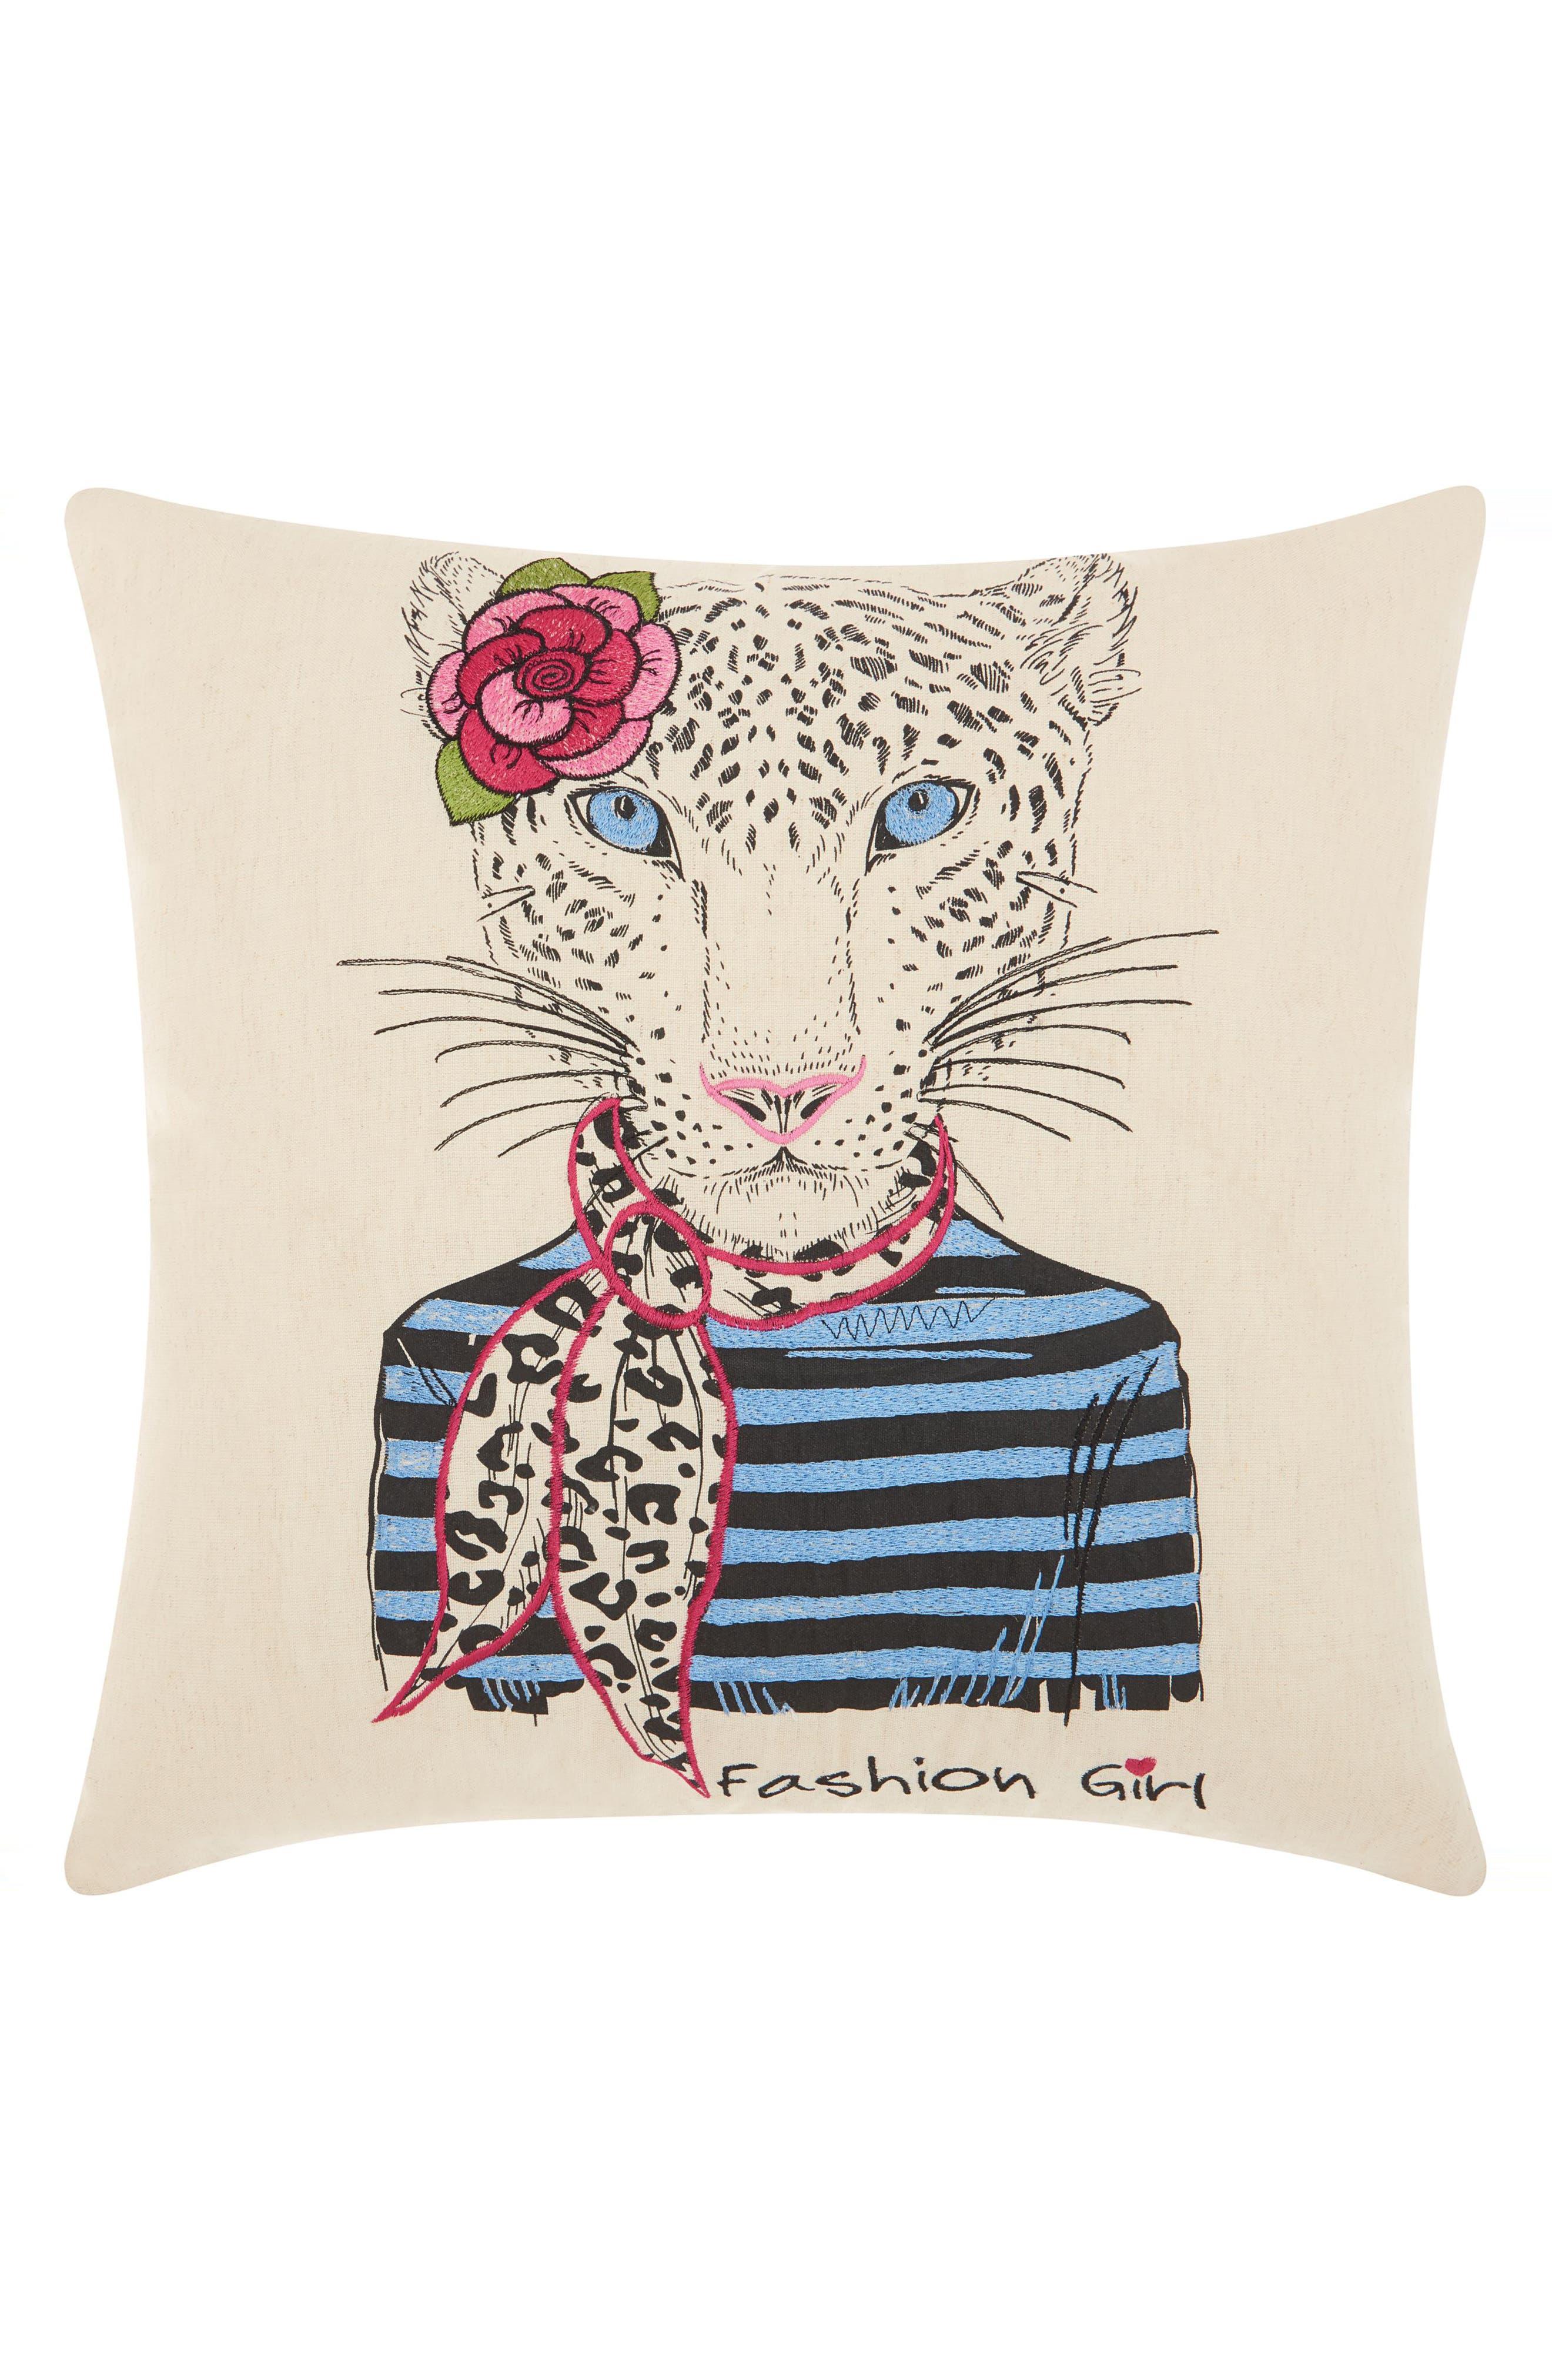 Snow Leopard Scarf Accent Pillow,                             Main thumbnail 1, color,